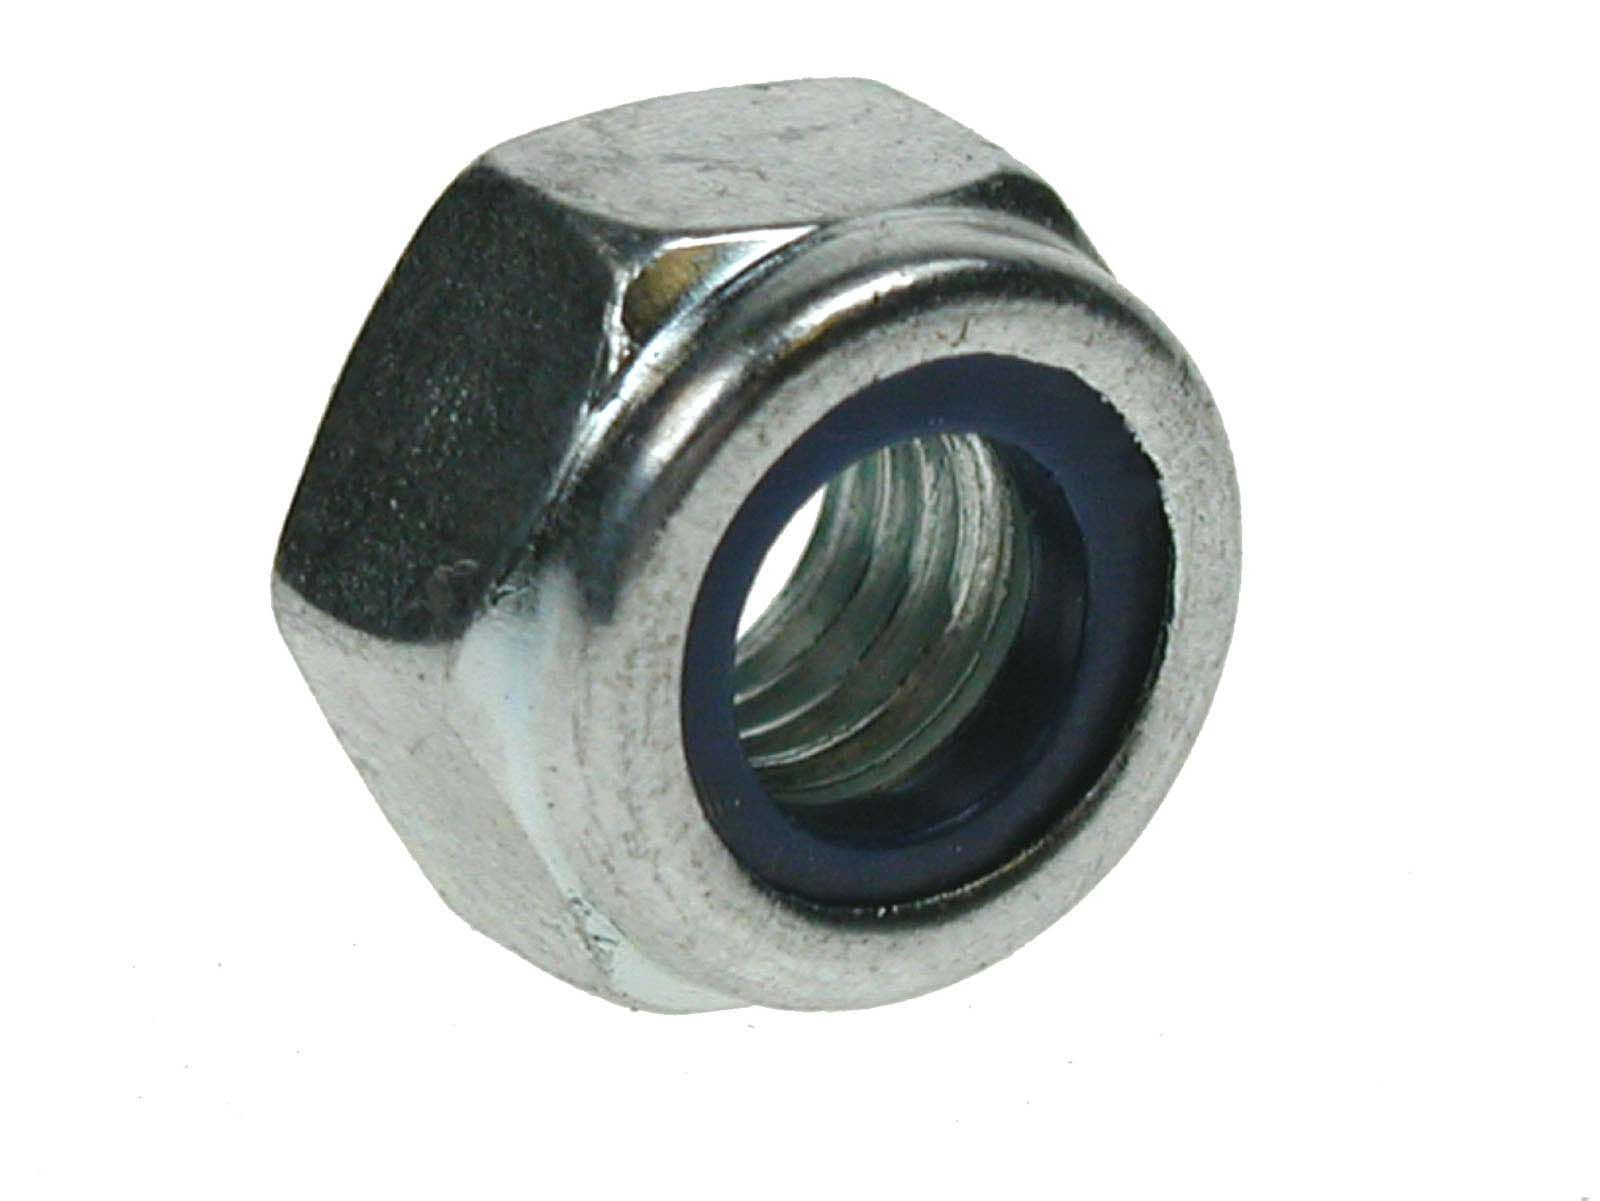 Unifix Nylon Locking Nuts DIN 982 Boxed